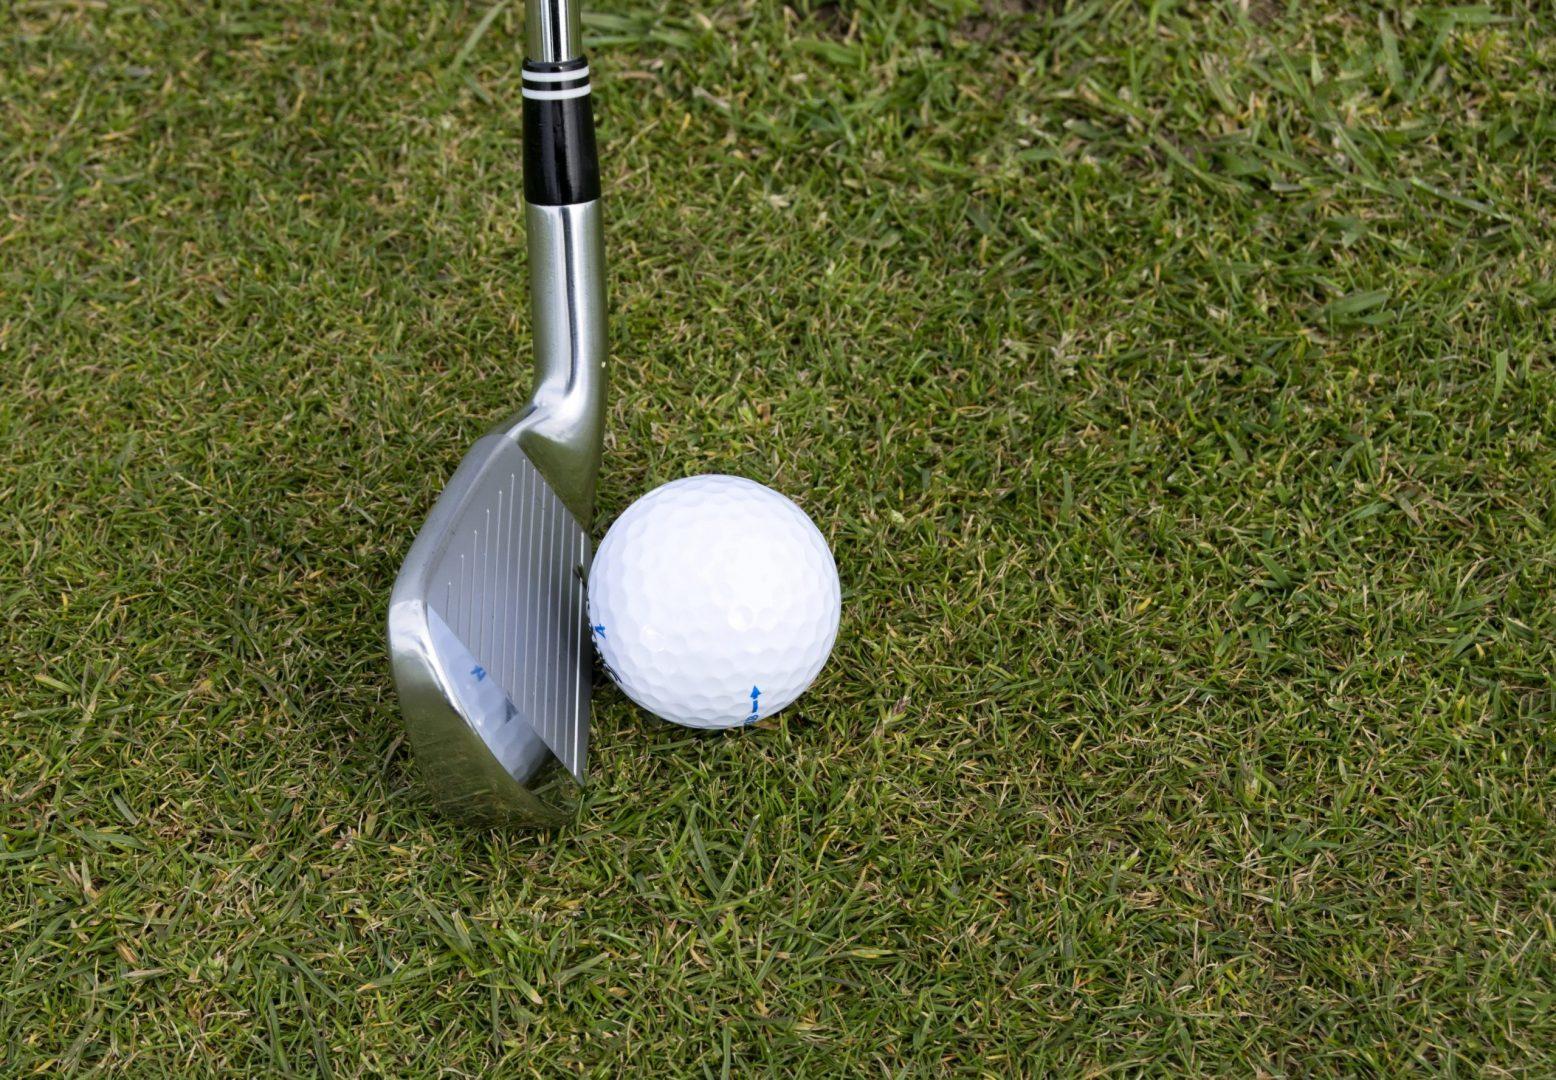 Crook Hill Park Golf Course